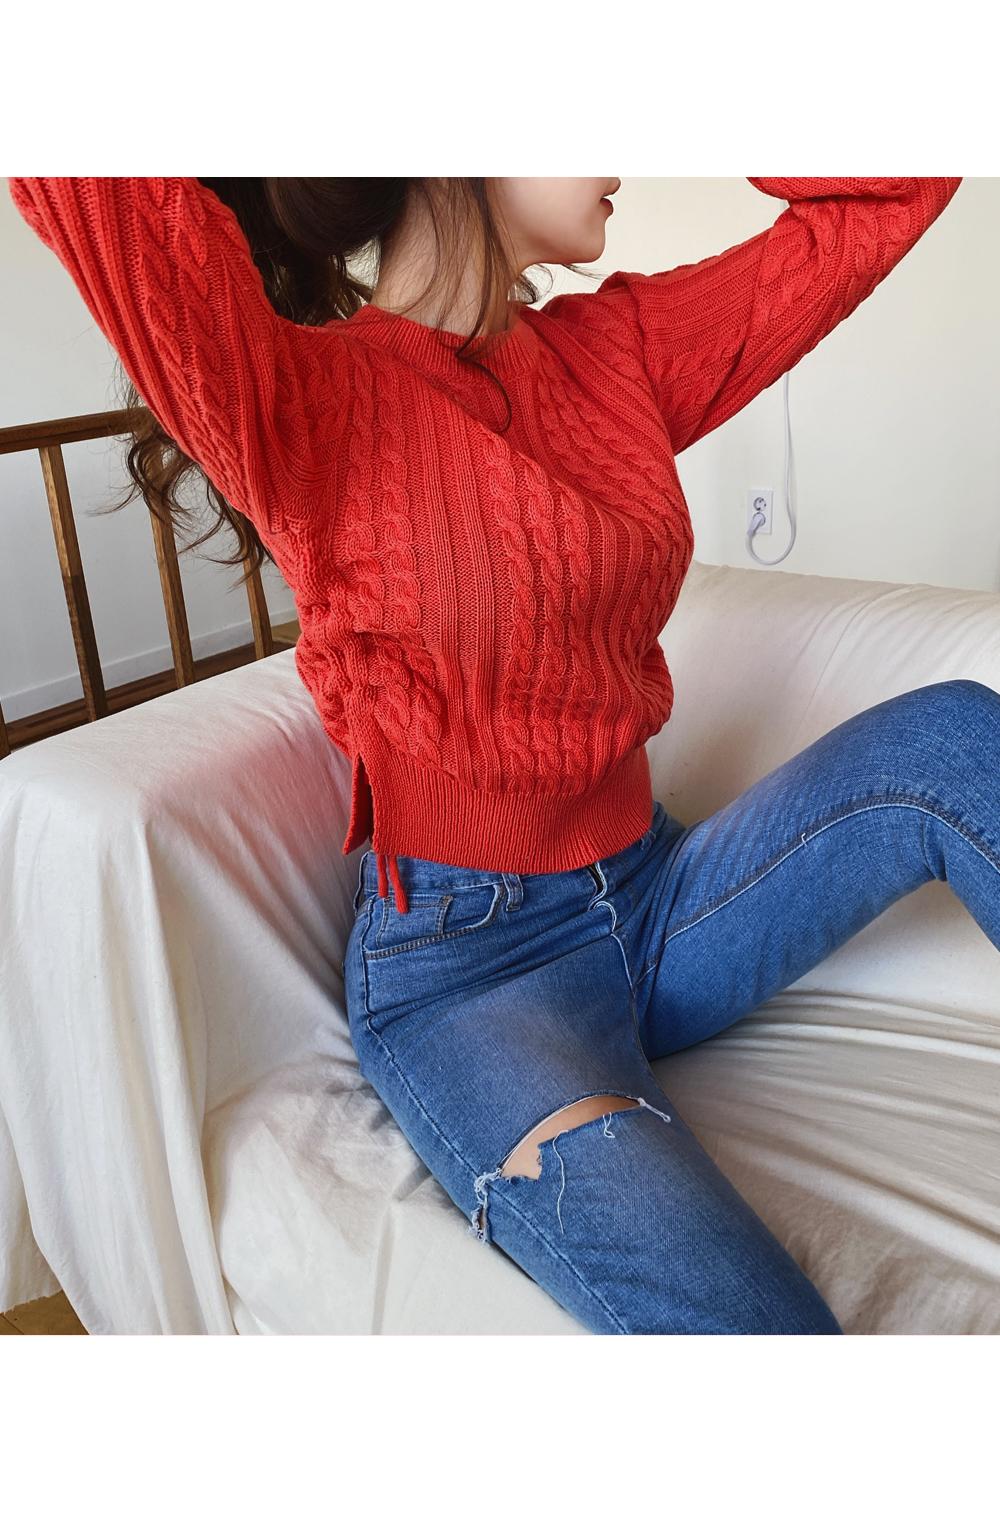 Attractive skinny pants